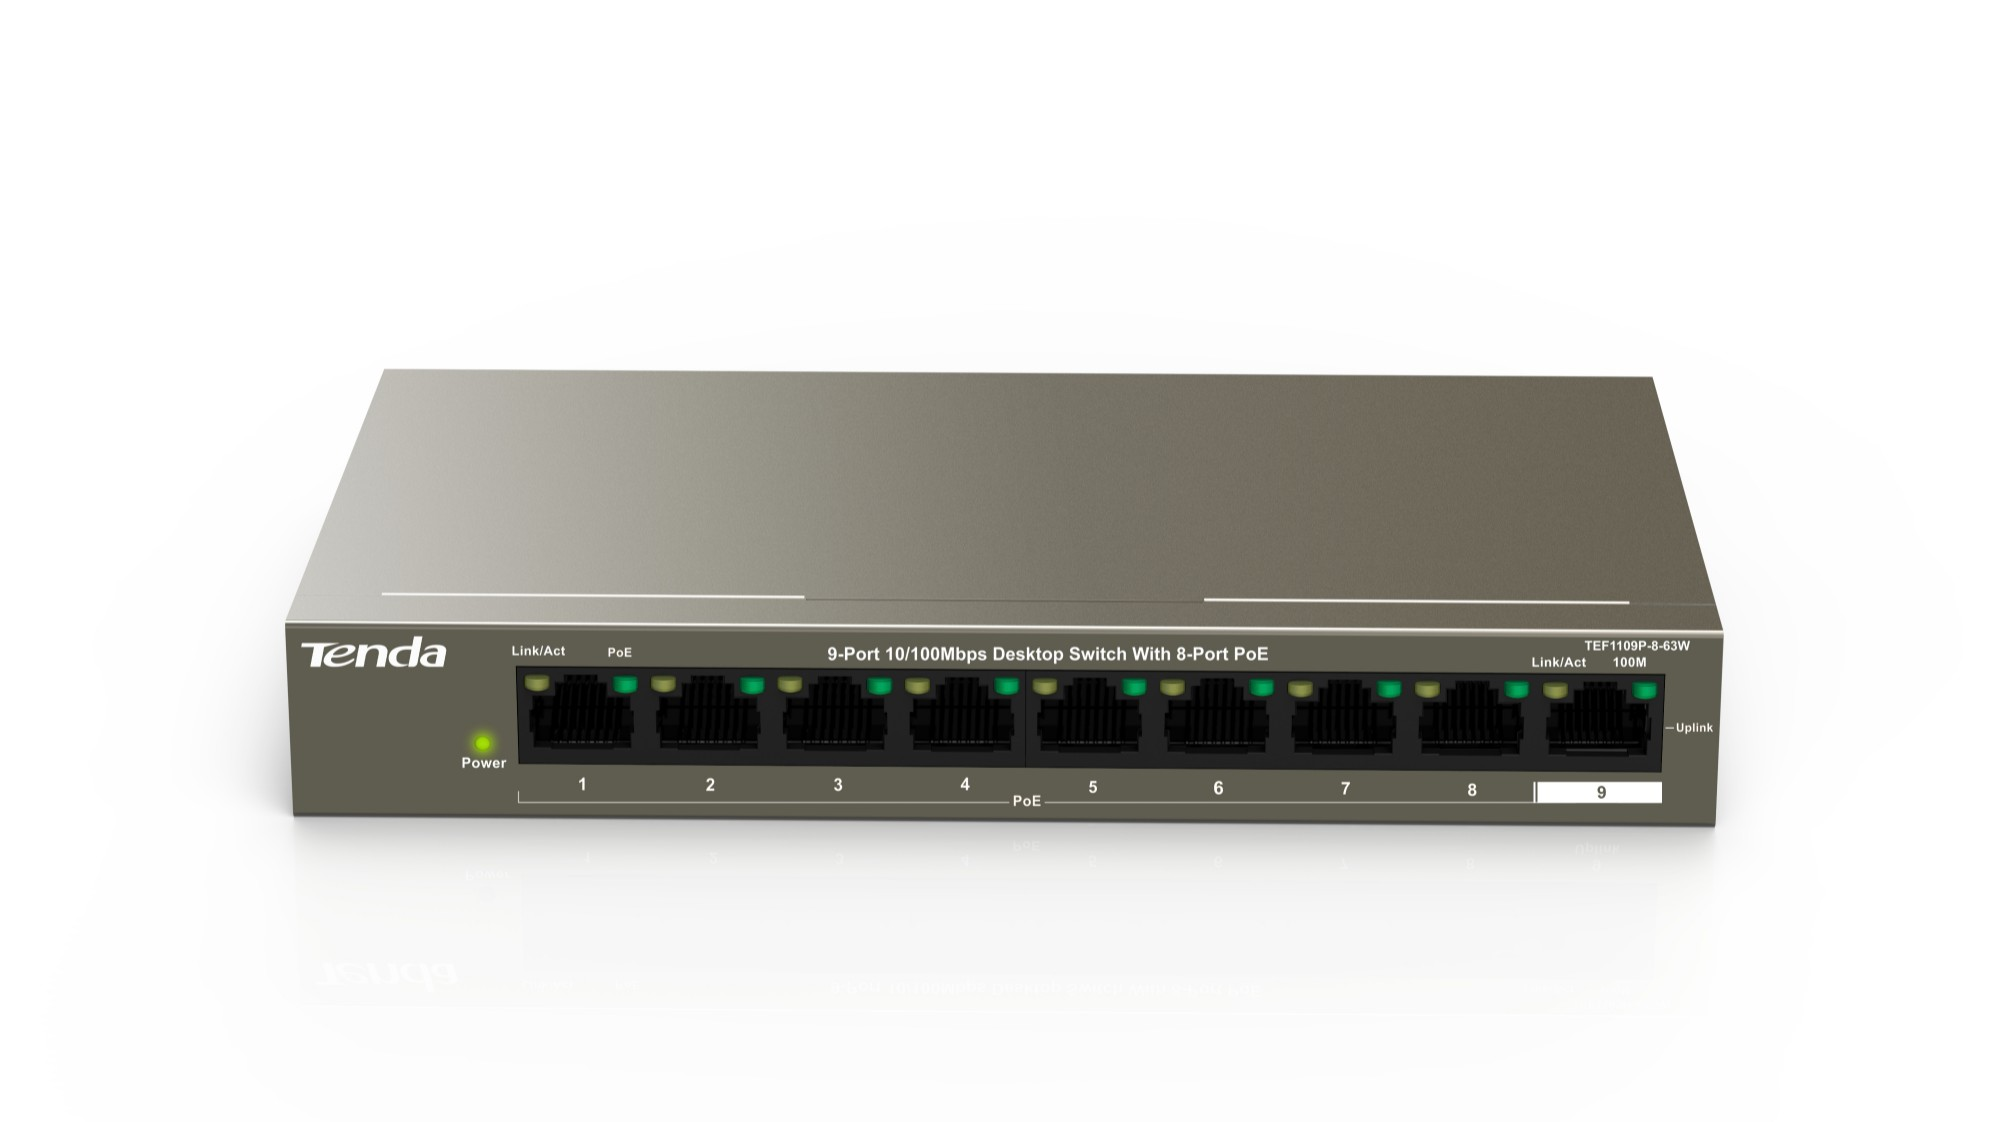 Tenda TEF1109P-8-63W Fast Ethernet (10/100) Negro Energía sobre Ethernet (PoE)